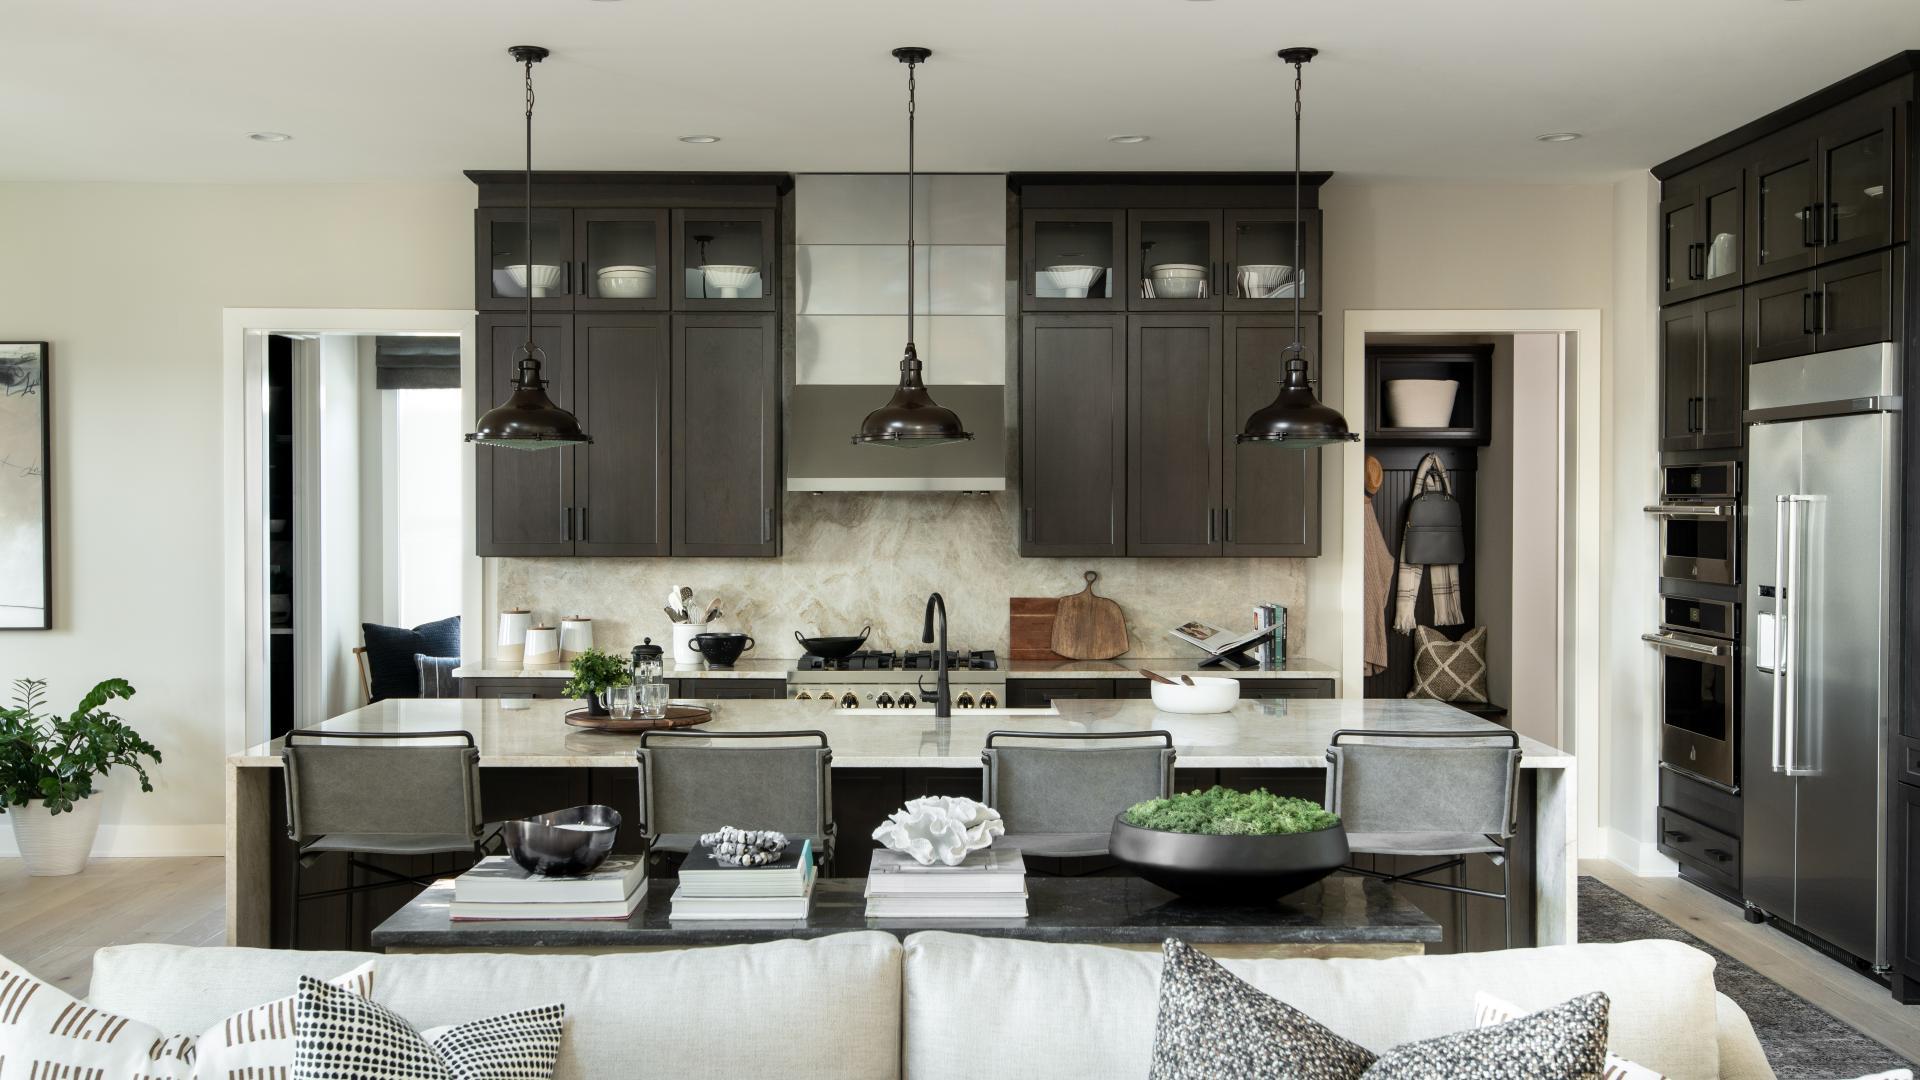 Parkhurst kitchen with expansive island